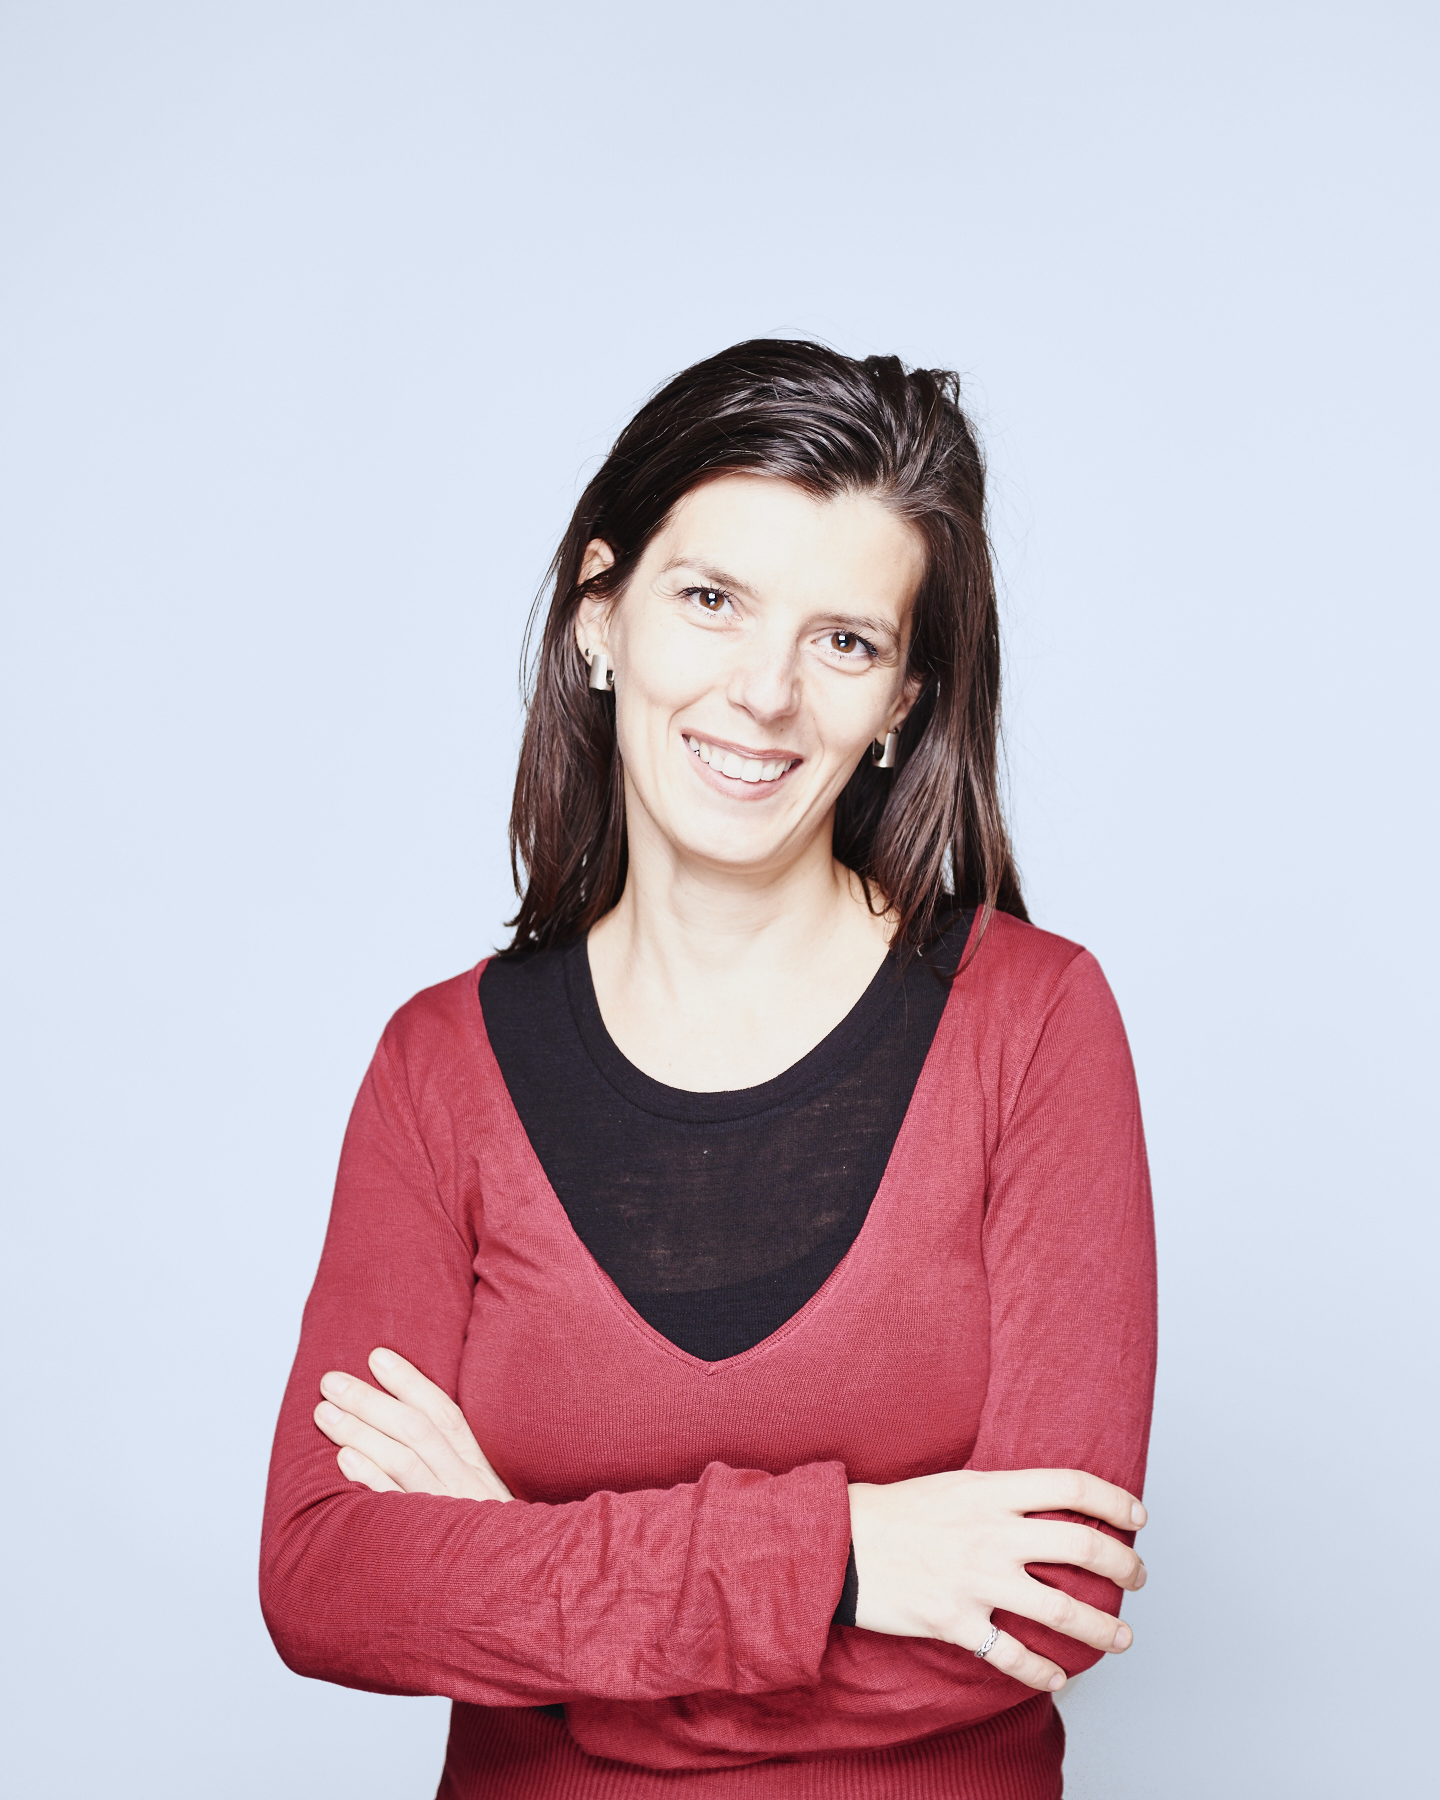 Klara Veer